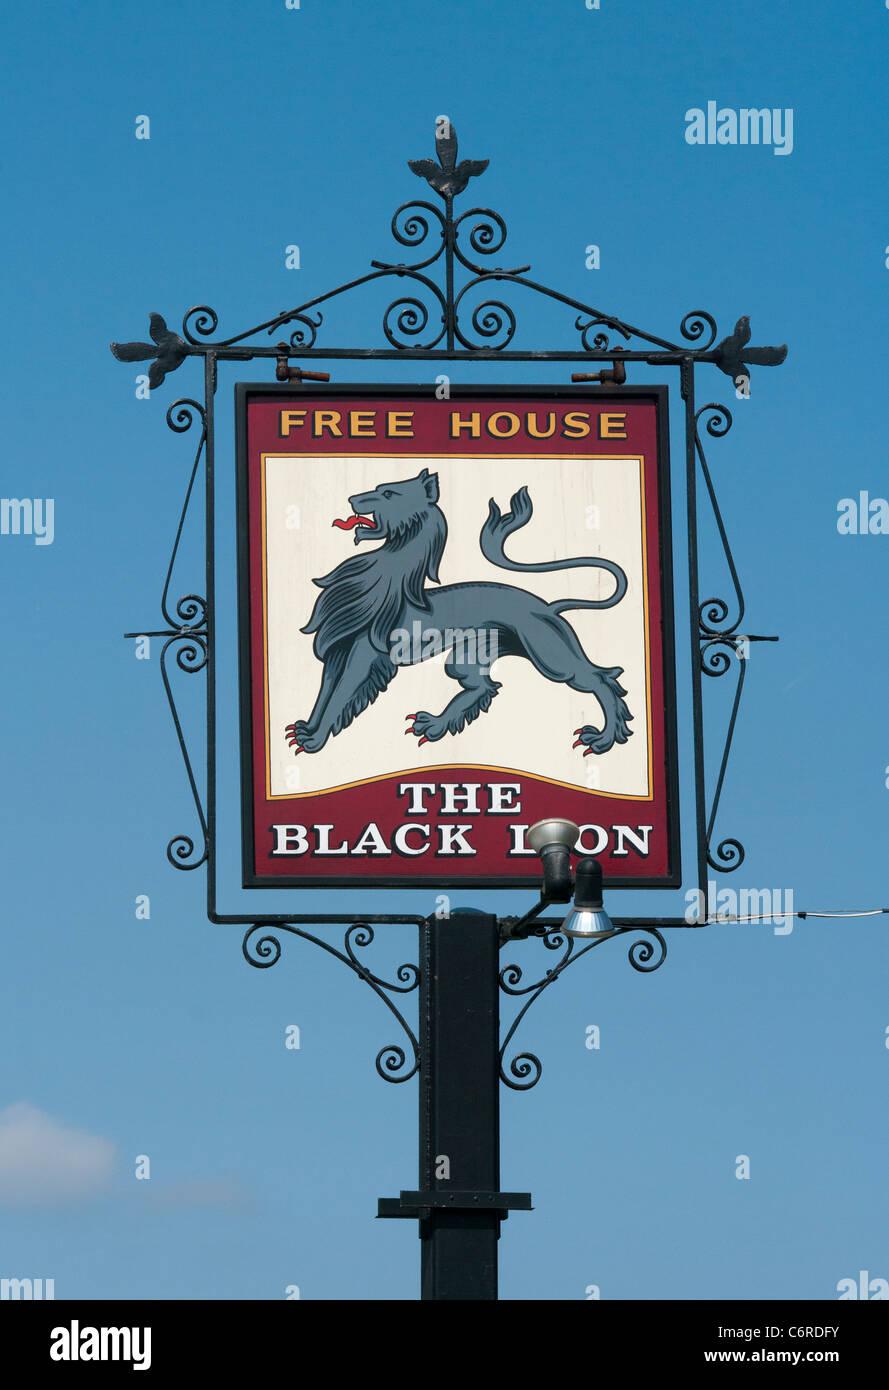 The Black Lion Free House Pub Sign UK Pub Signs - Stock Image